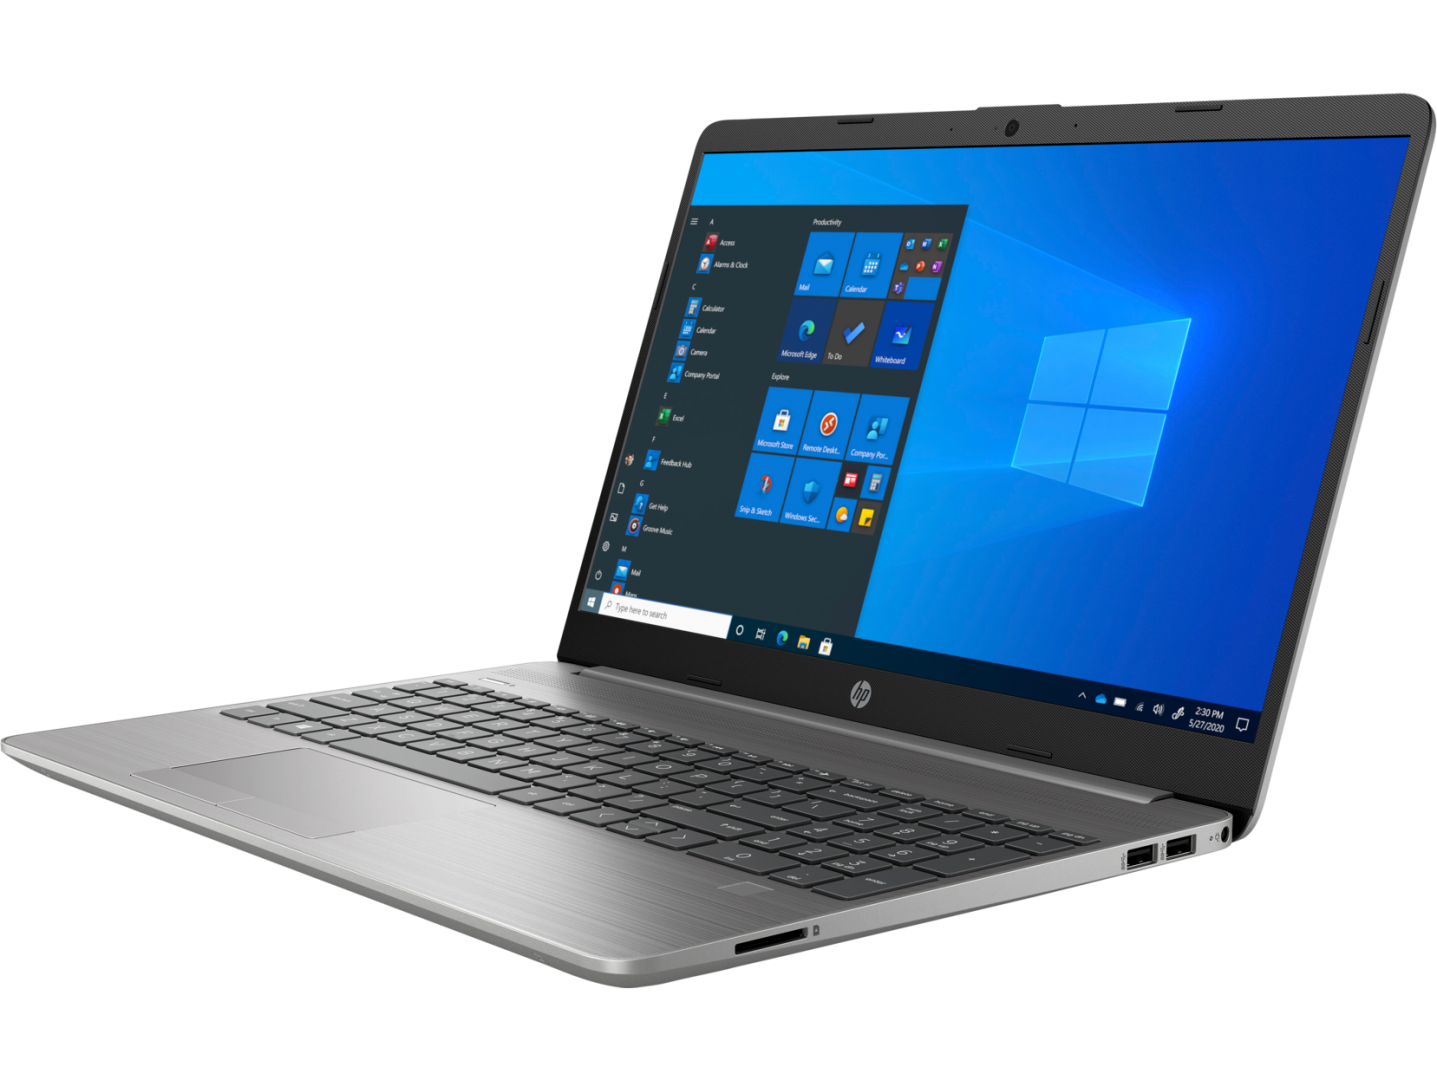 "NOTEBOOK HP 250G8 15.6"" FHD i7-1165G7 16GB 512GB UMA W10P - imaginea 2"